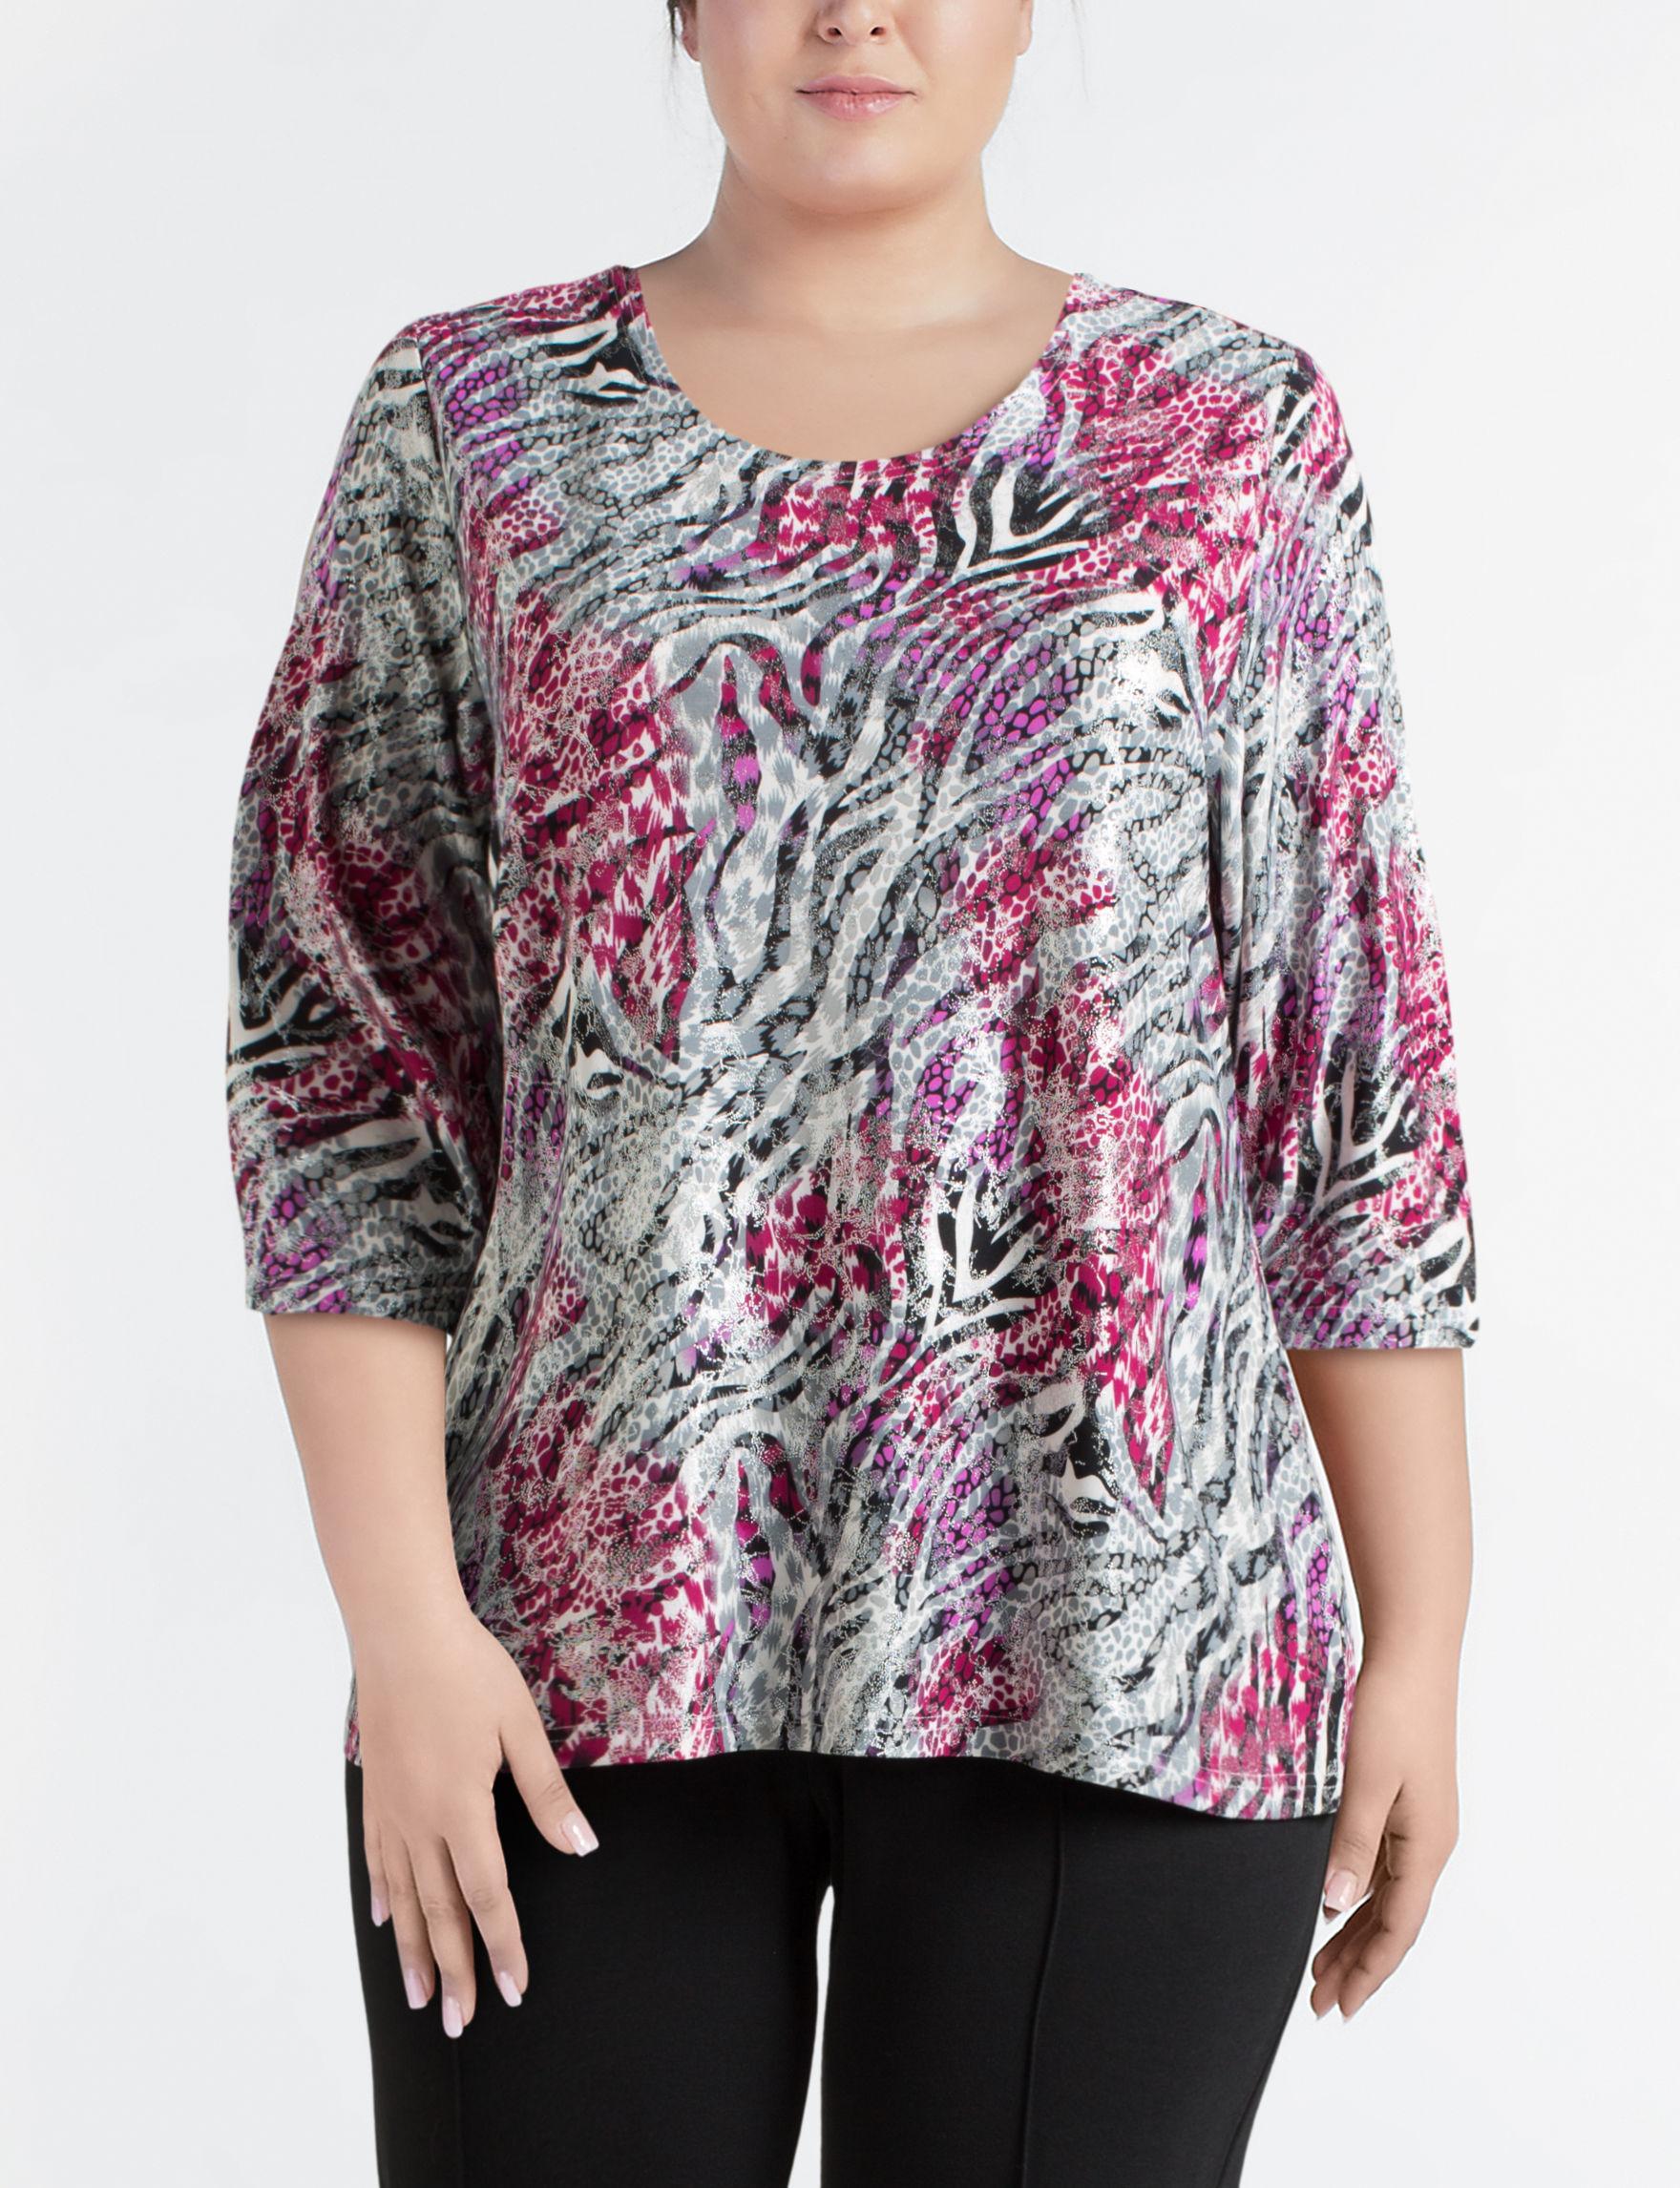 Rebecca Malone Red Multi Shirts & Blouses